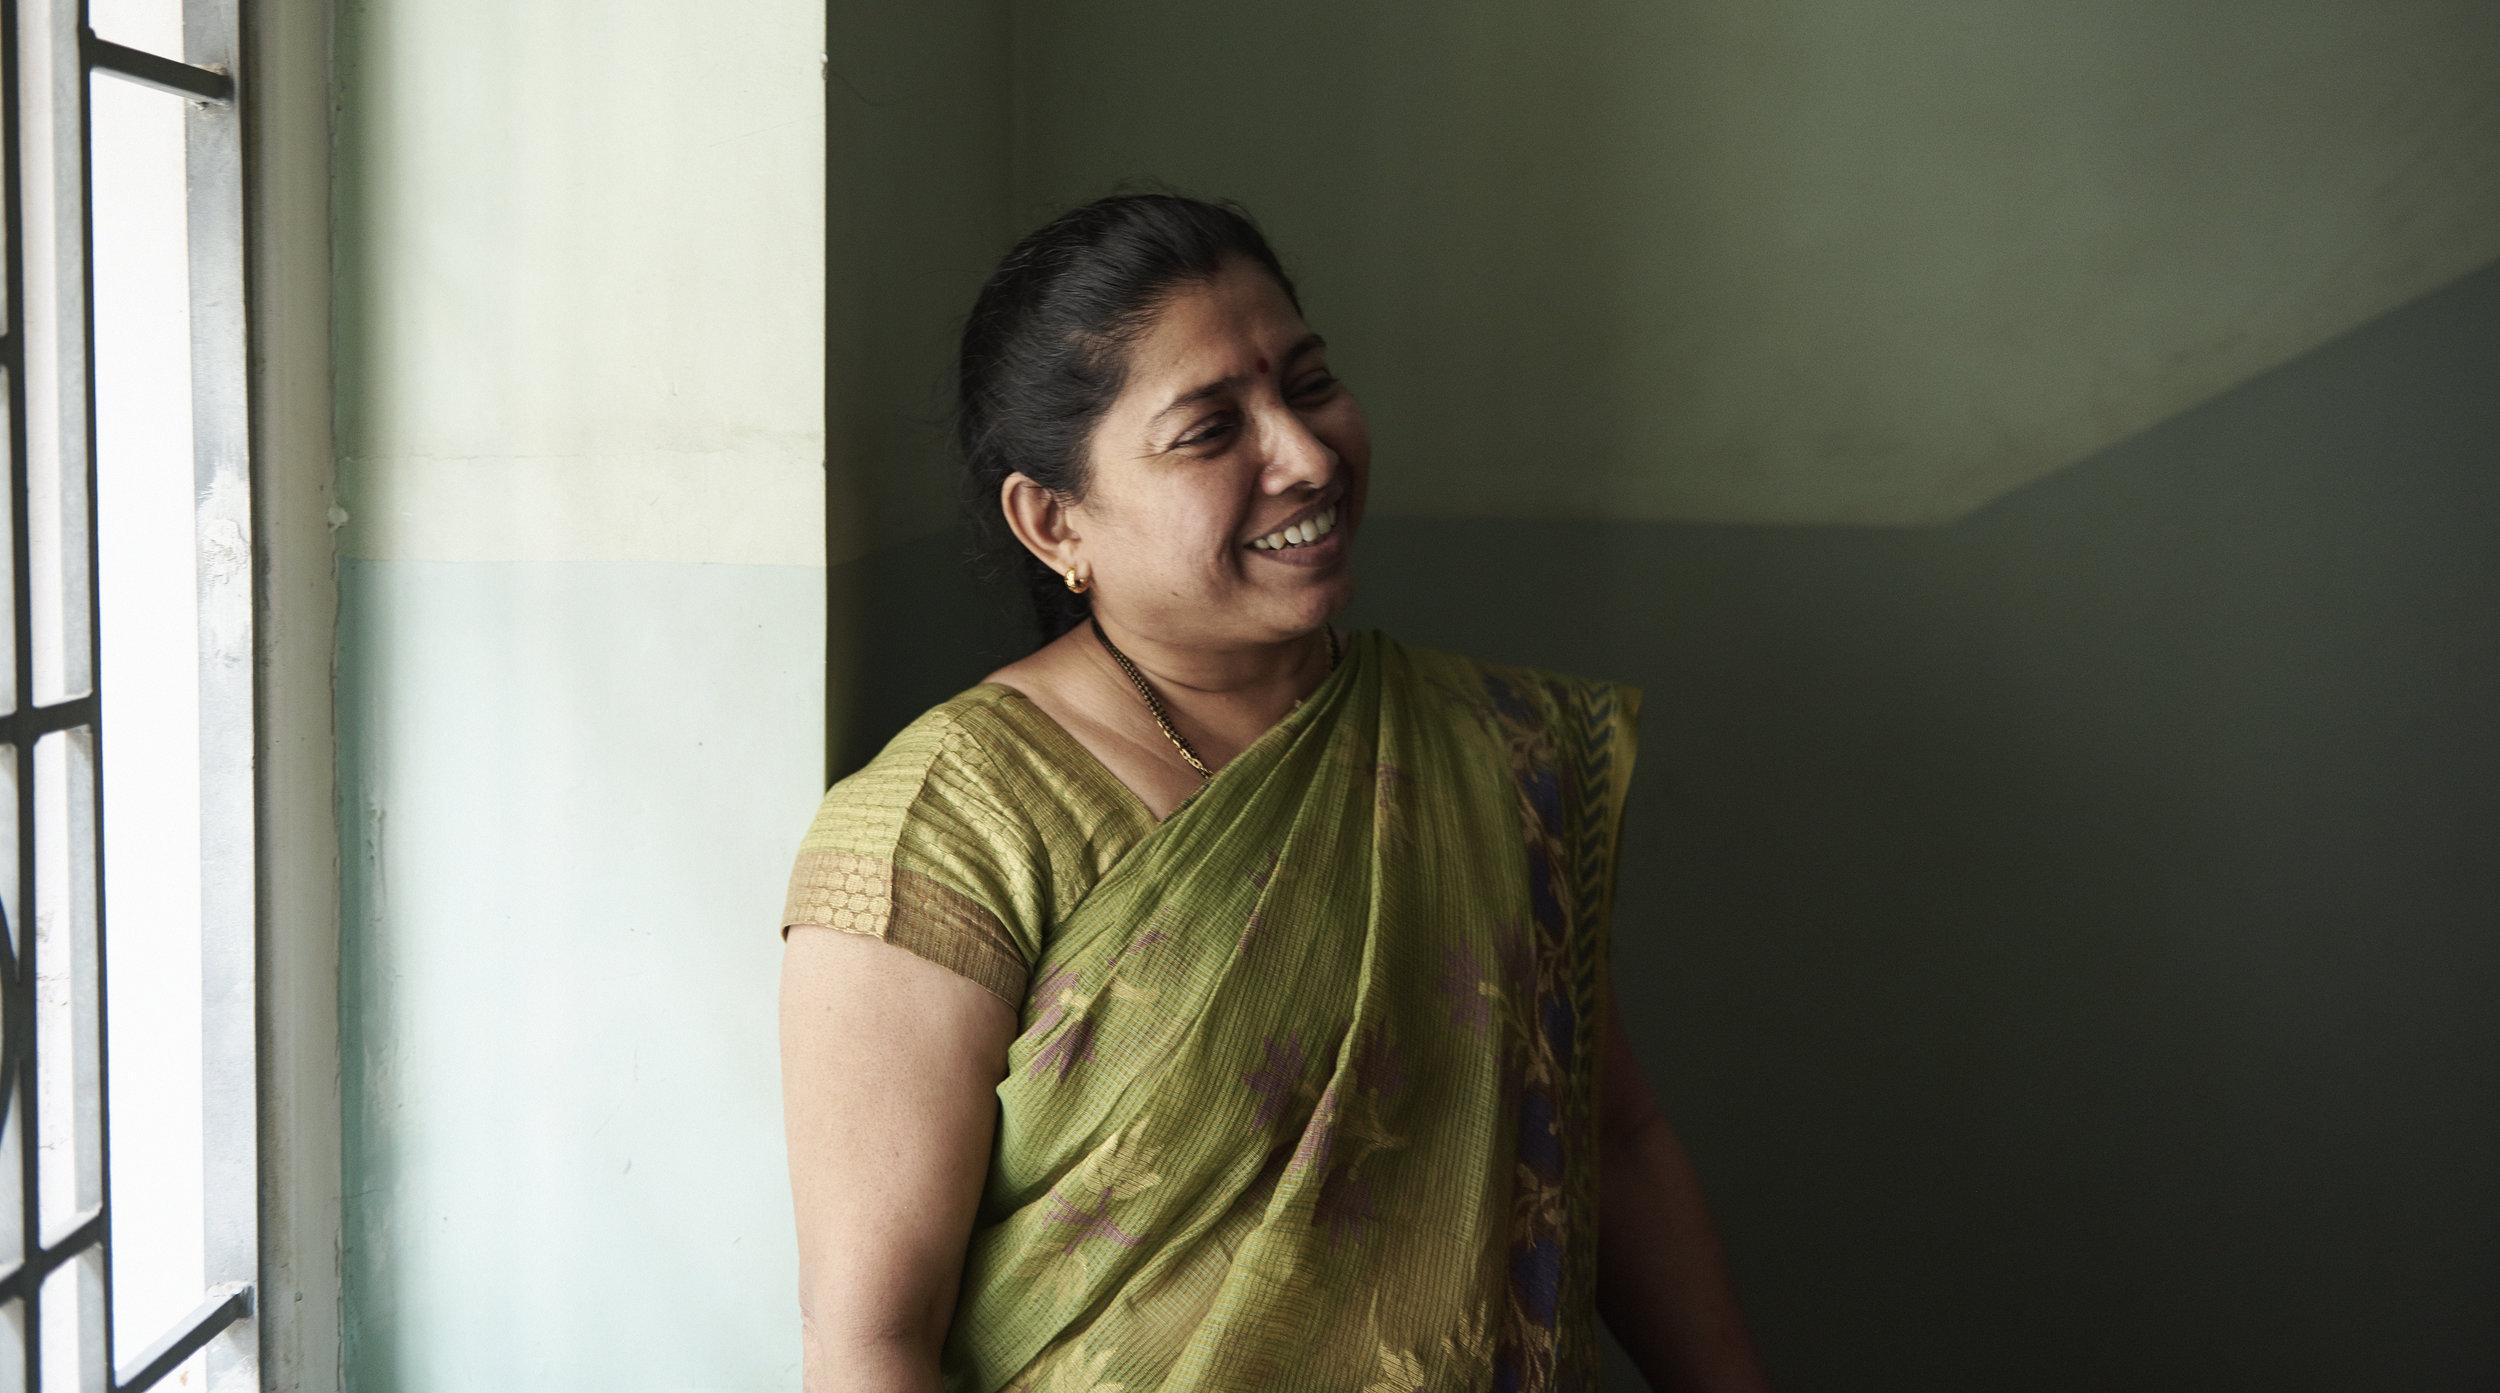 Sarita Shekar Gandhi, Head Librarian at KR Cama Oriental Institute